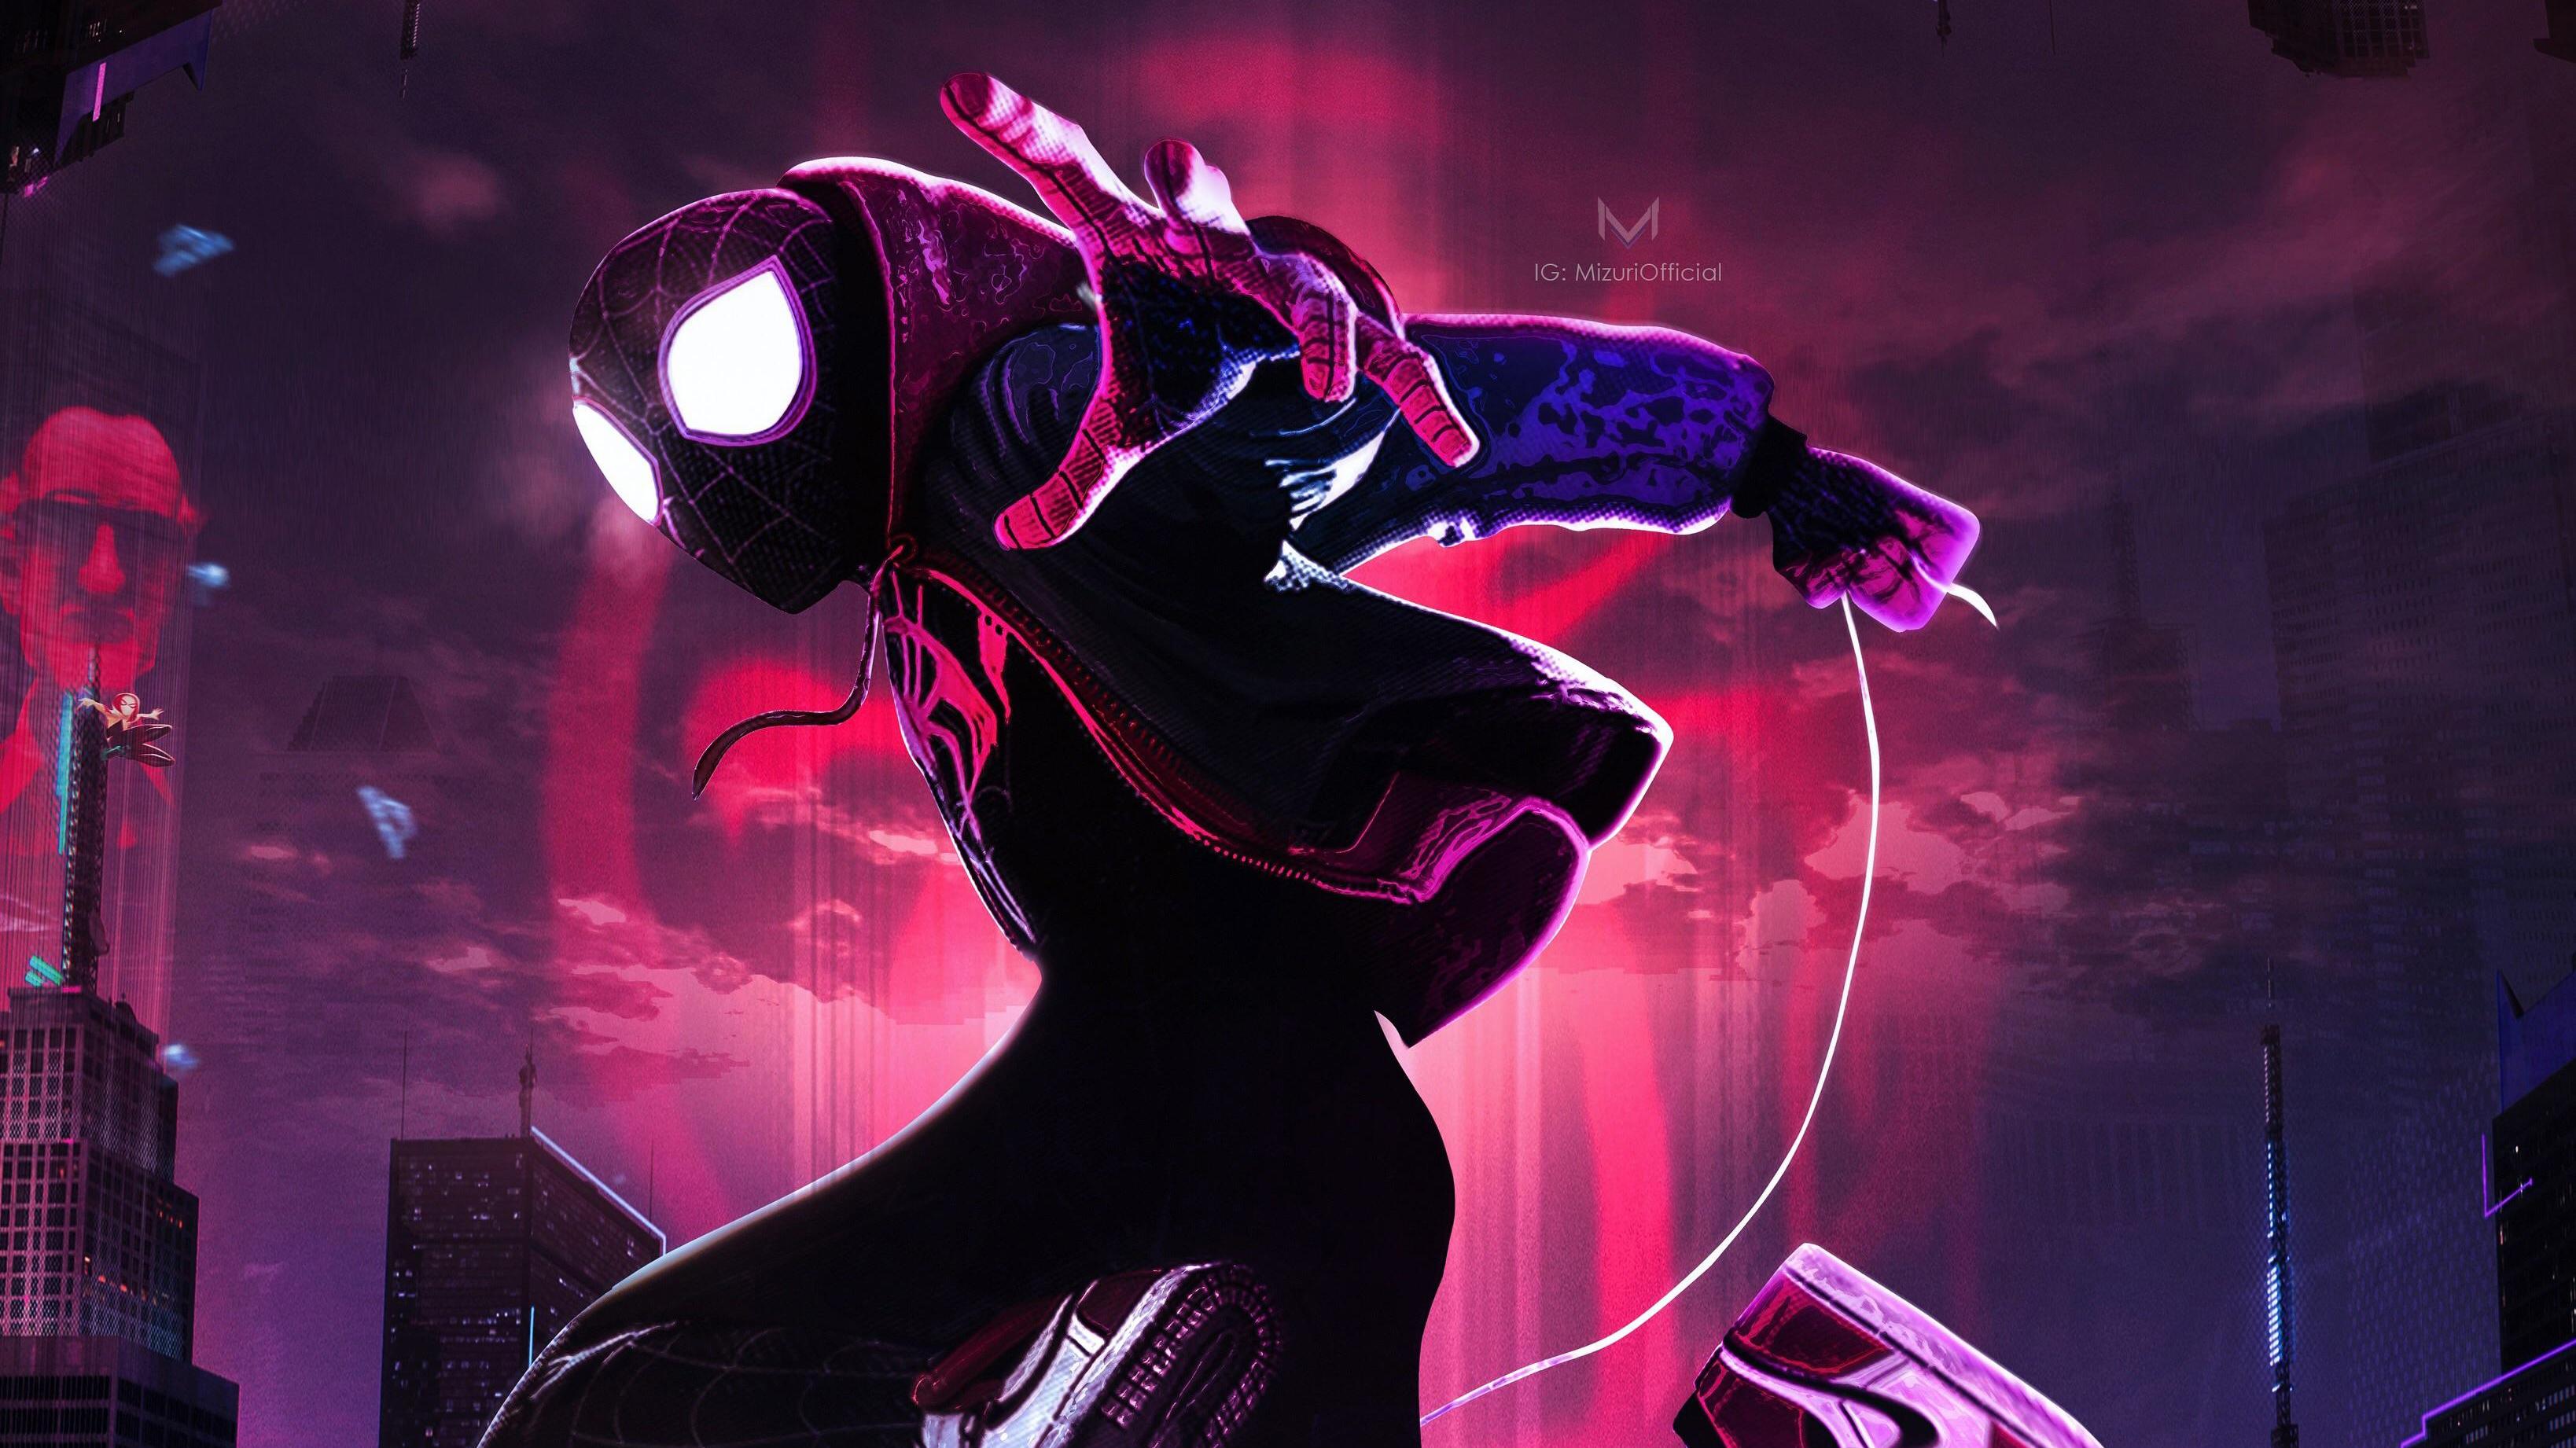 Wallpaper Spider Man 2099 Fan Art 4k Creative Graphics: Miles Morales HD Wallpaper